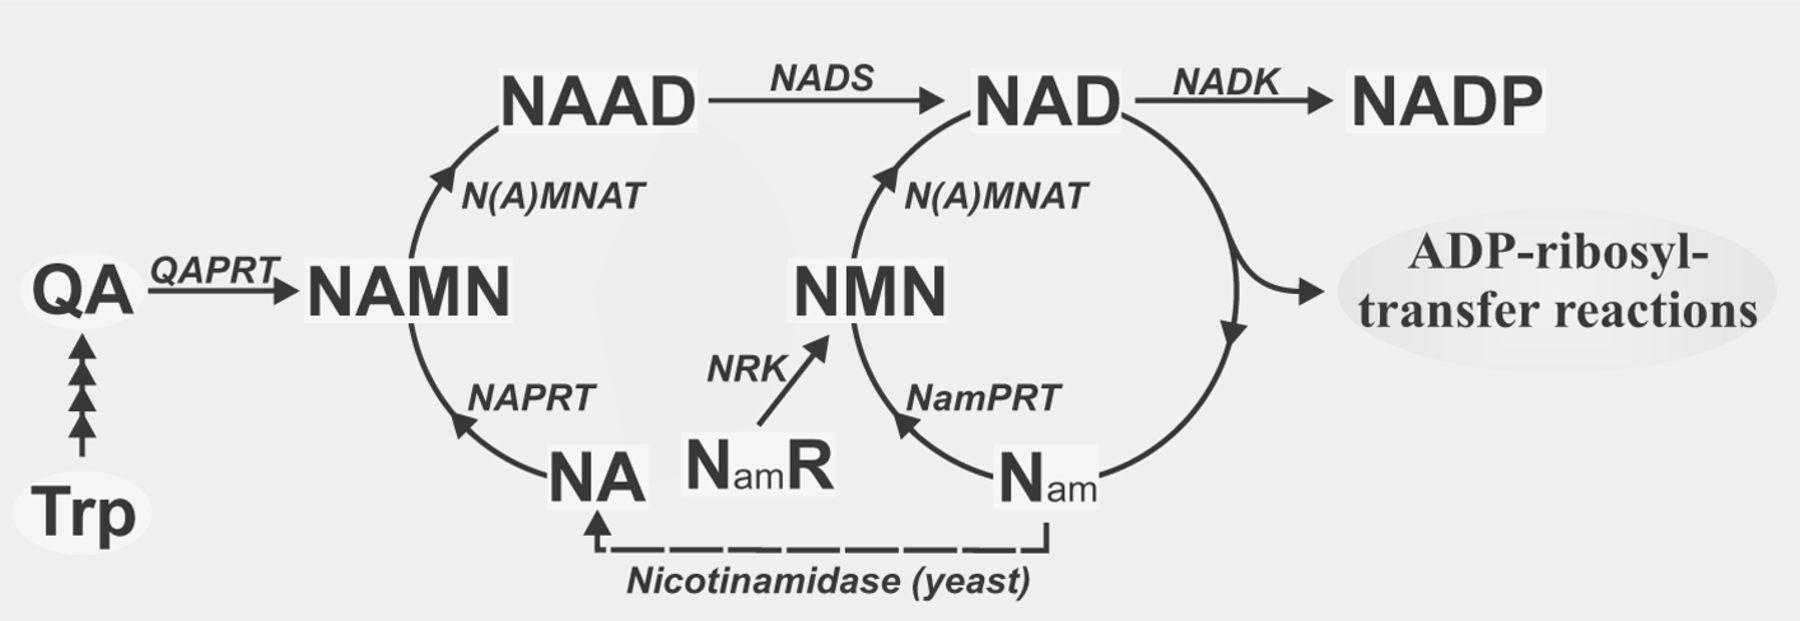 Nicotinamide mononucleotide | The Science of Parkinson's